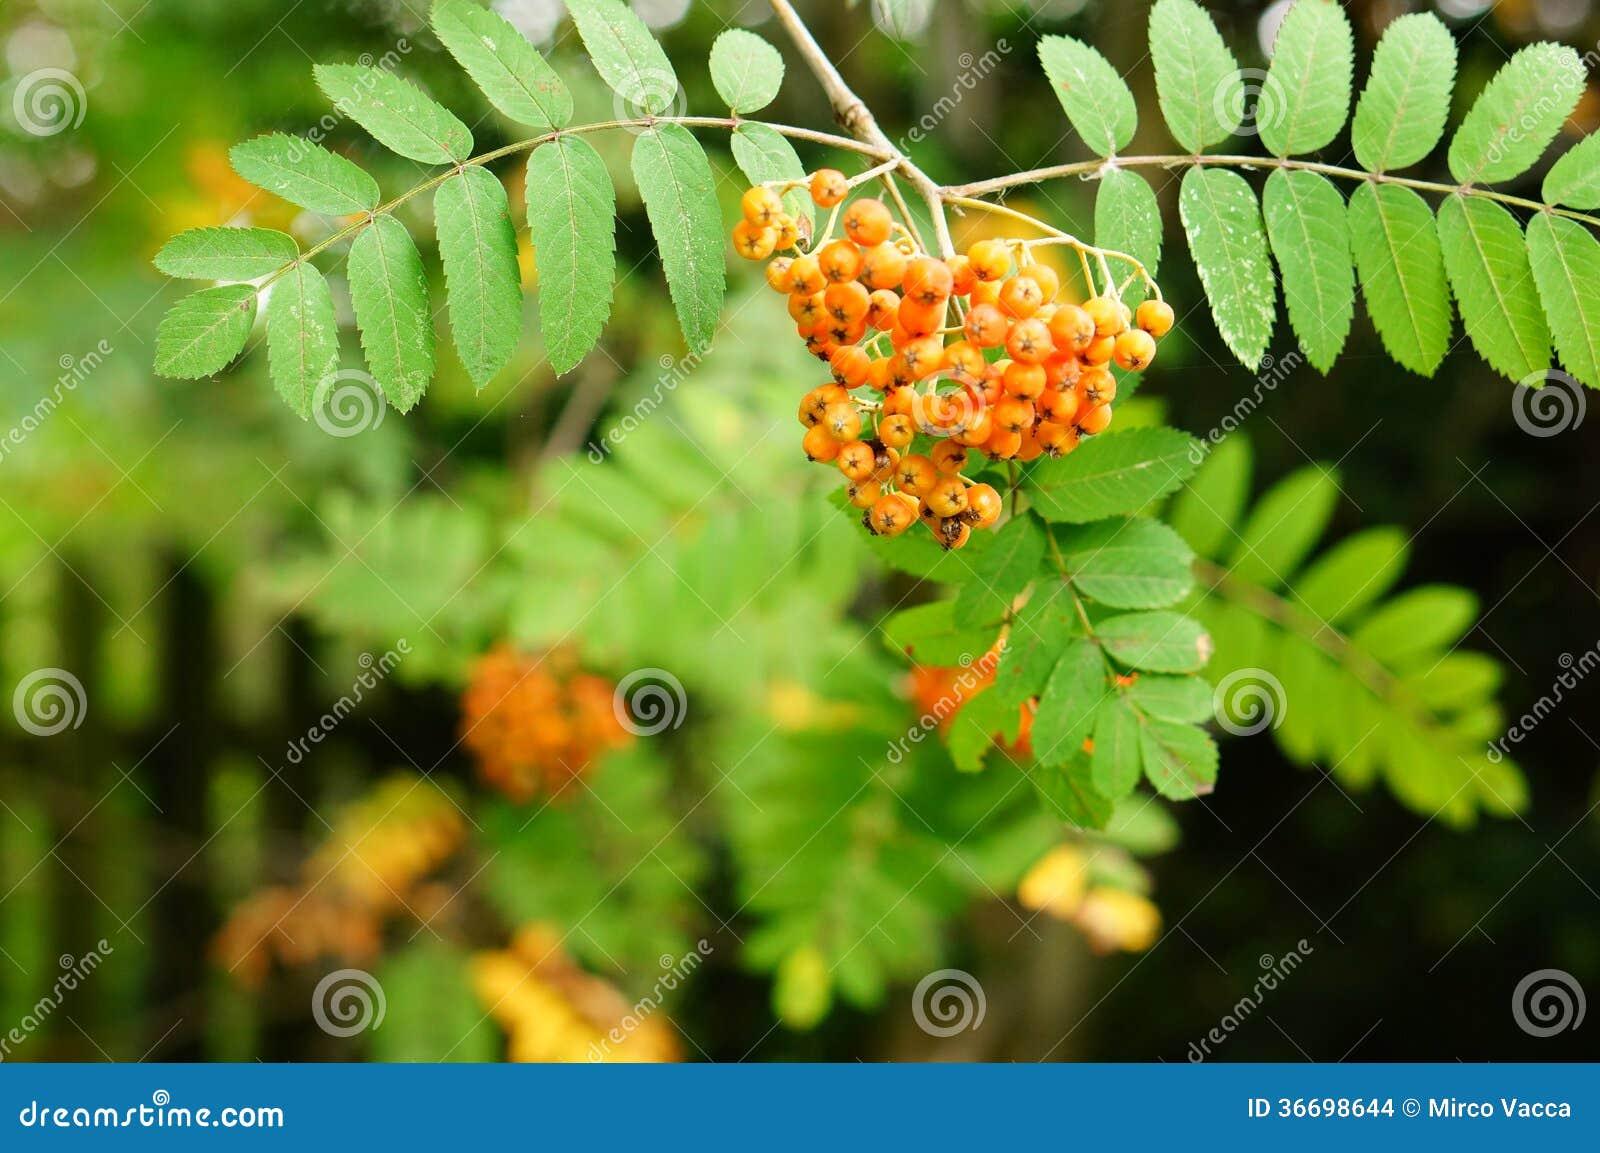 Orange berries stock images image 36698644